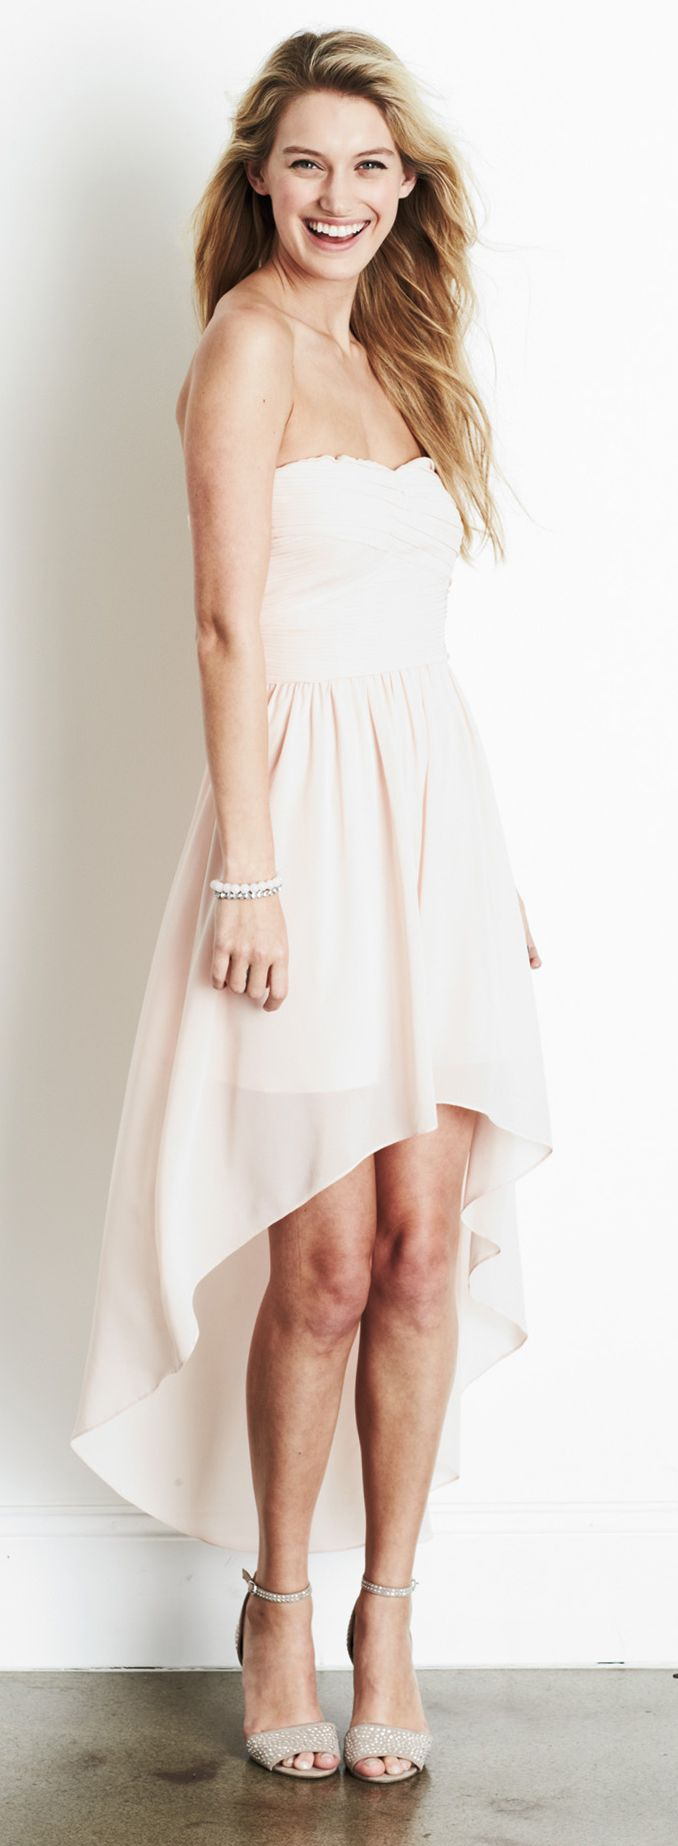 Best Delias Prom Dresses Pictures - Styles & Ideas 2018 - sperr.us